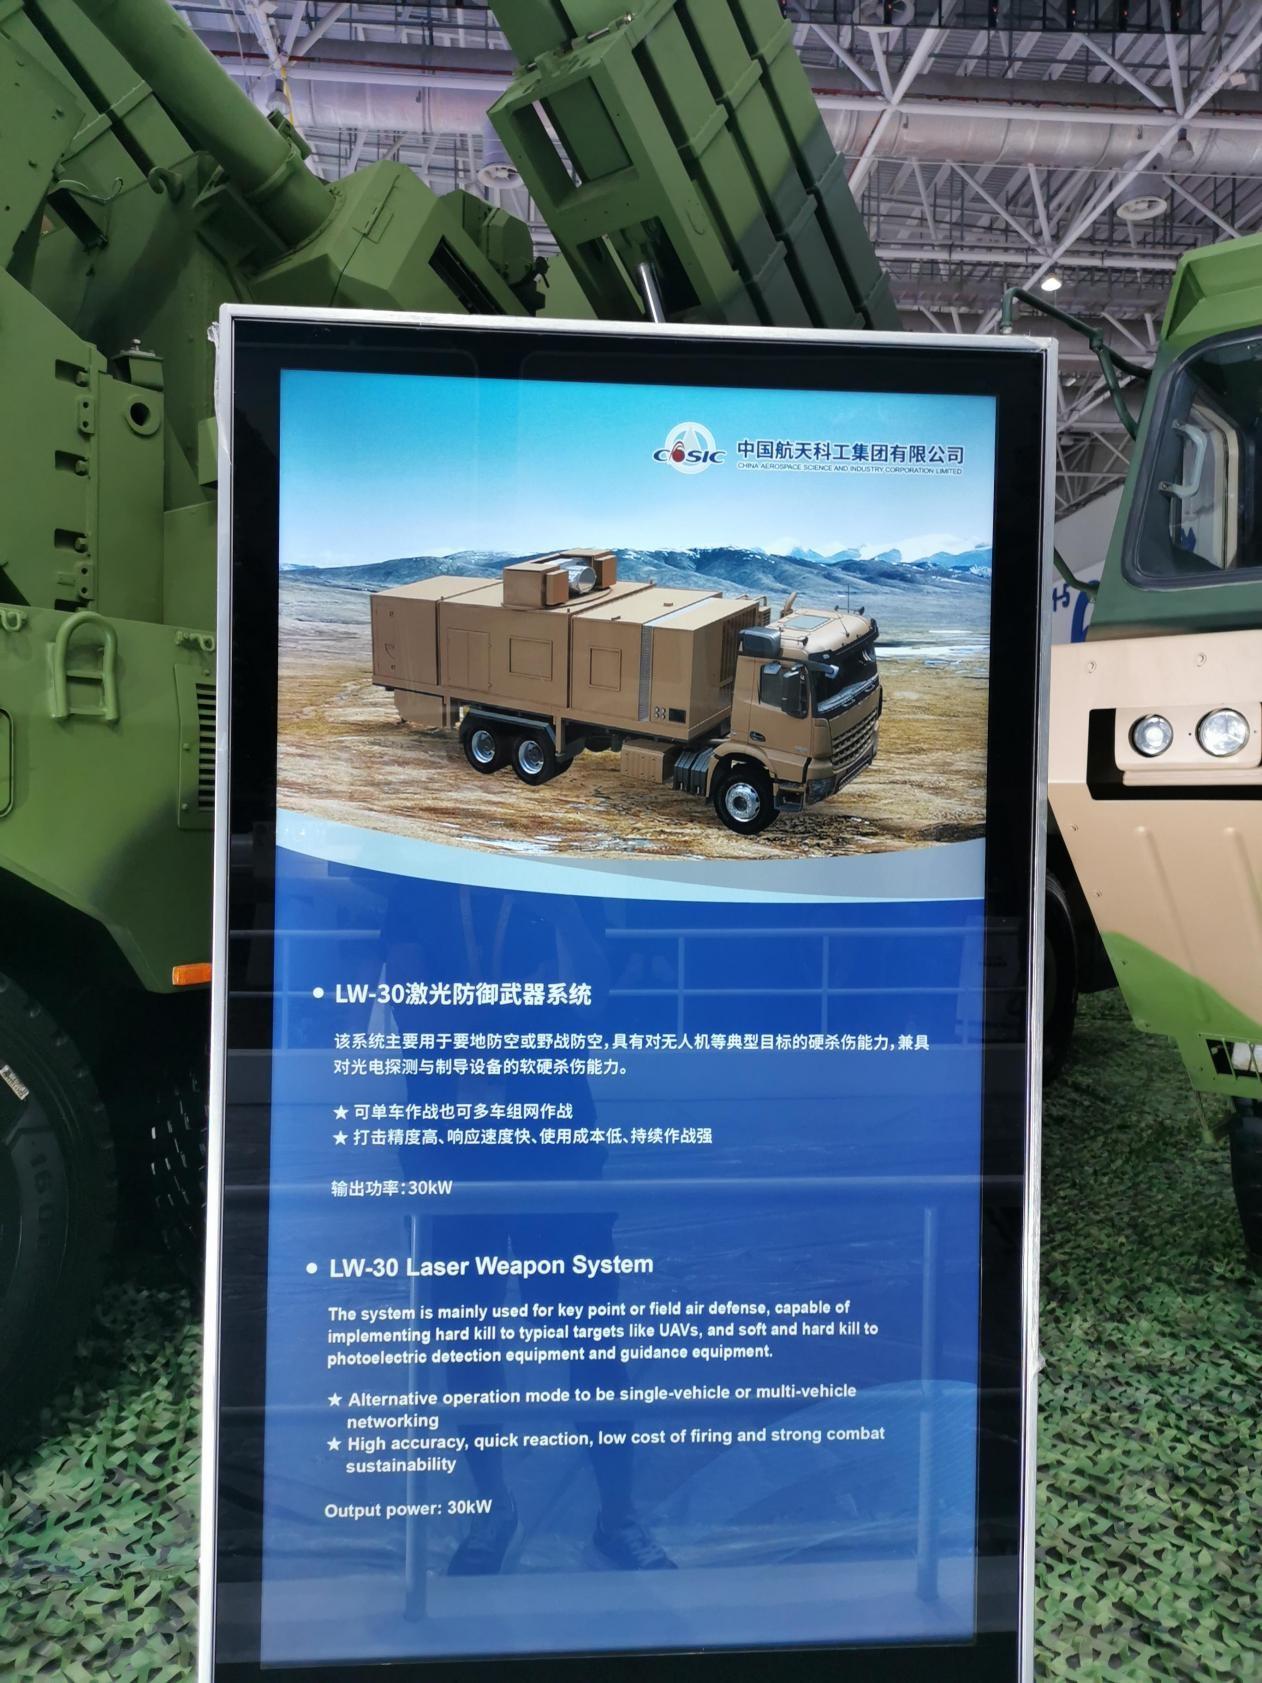 LW-30激光武器可以用于对付无人机等目标。